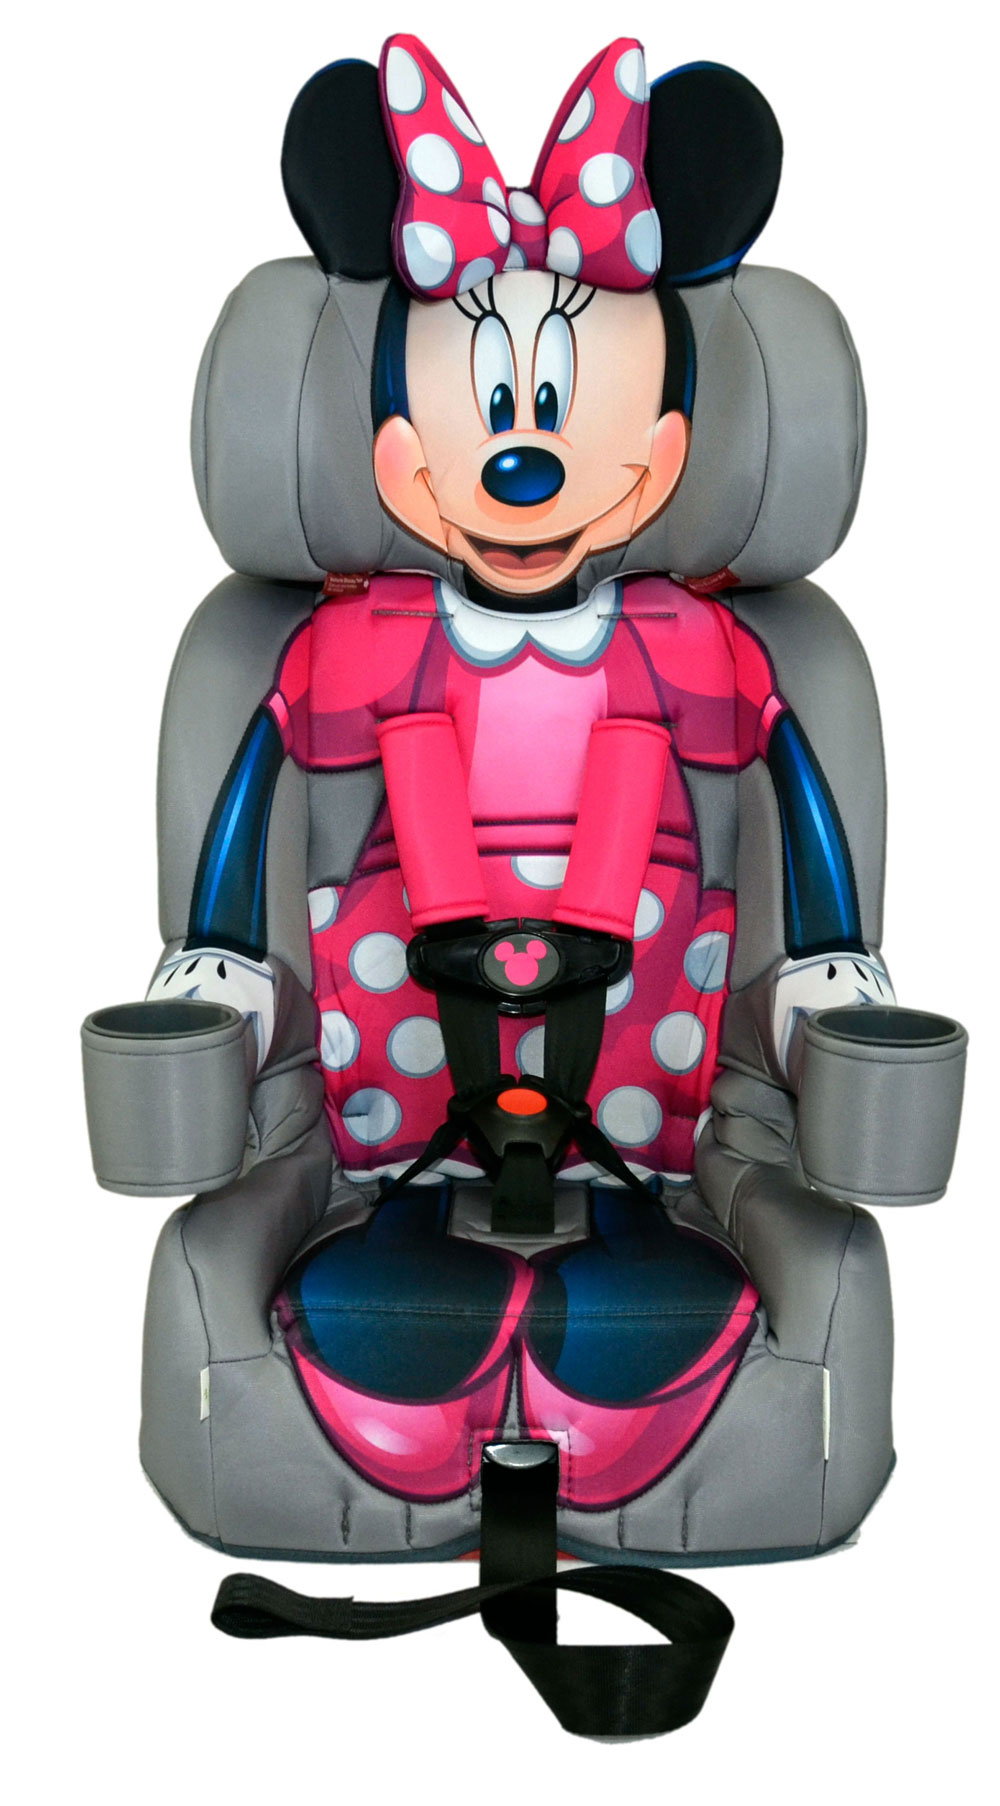 Kidsembrace Friendship Combination Booster Car Seat